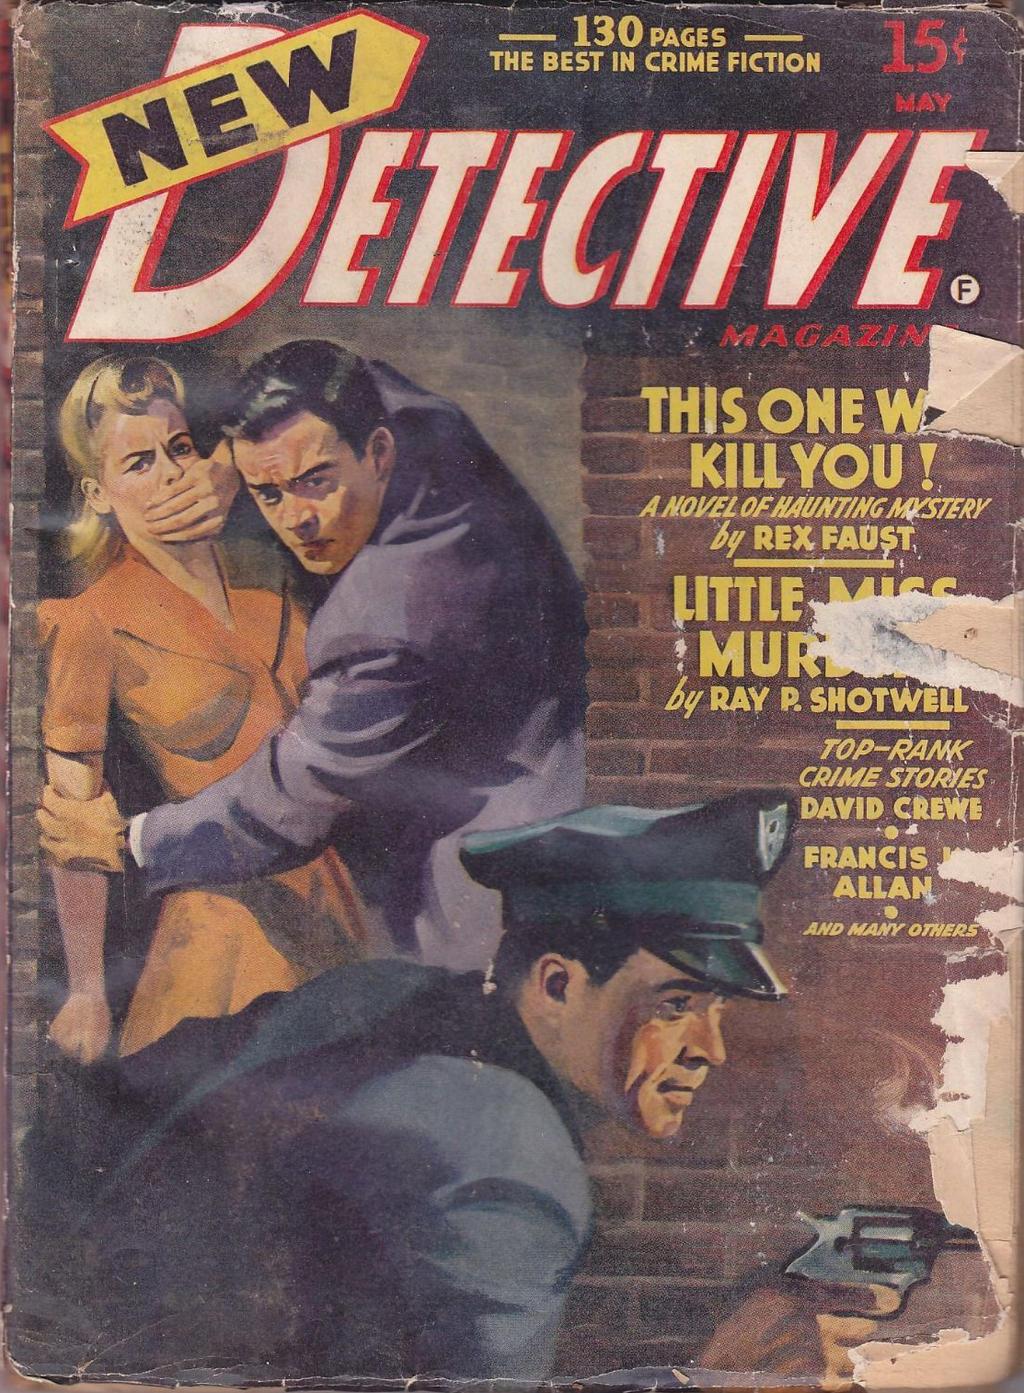 New Detective by trichyda